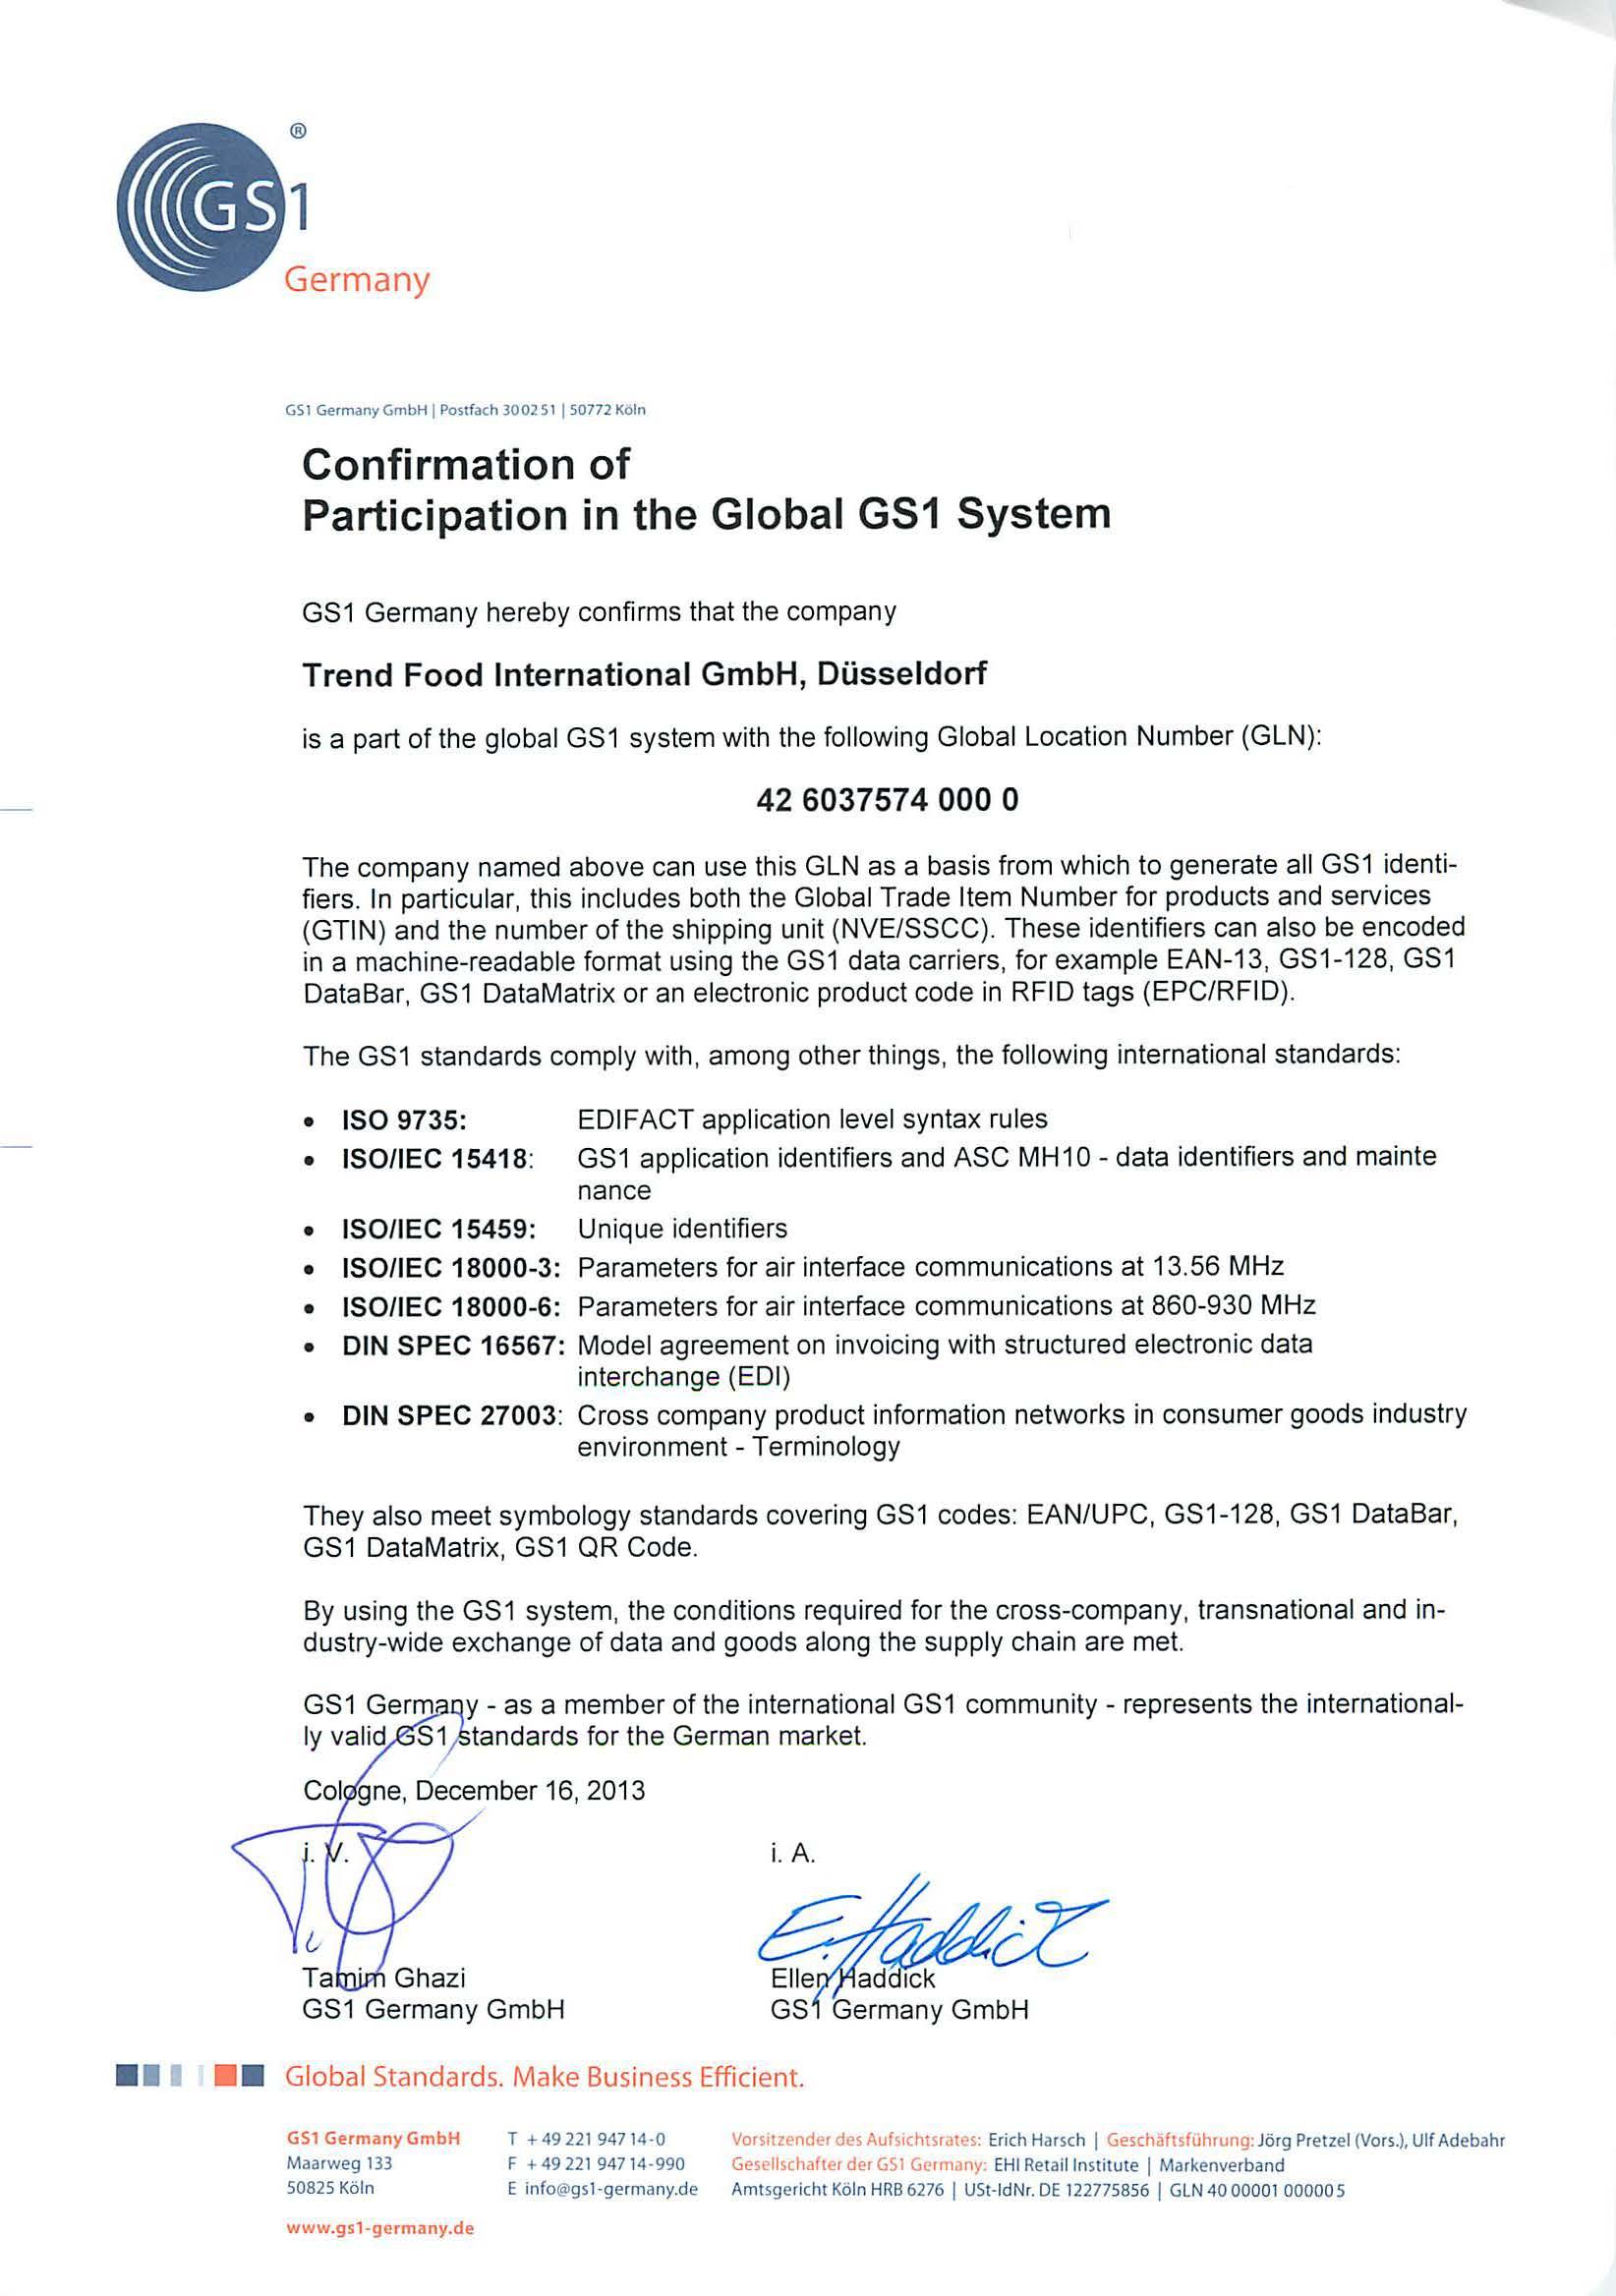 Certificates Trend Food International